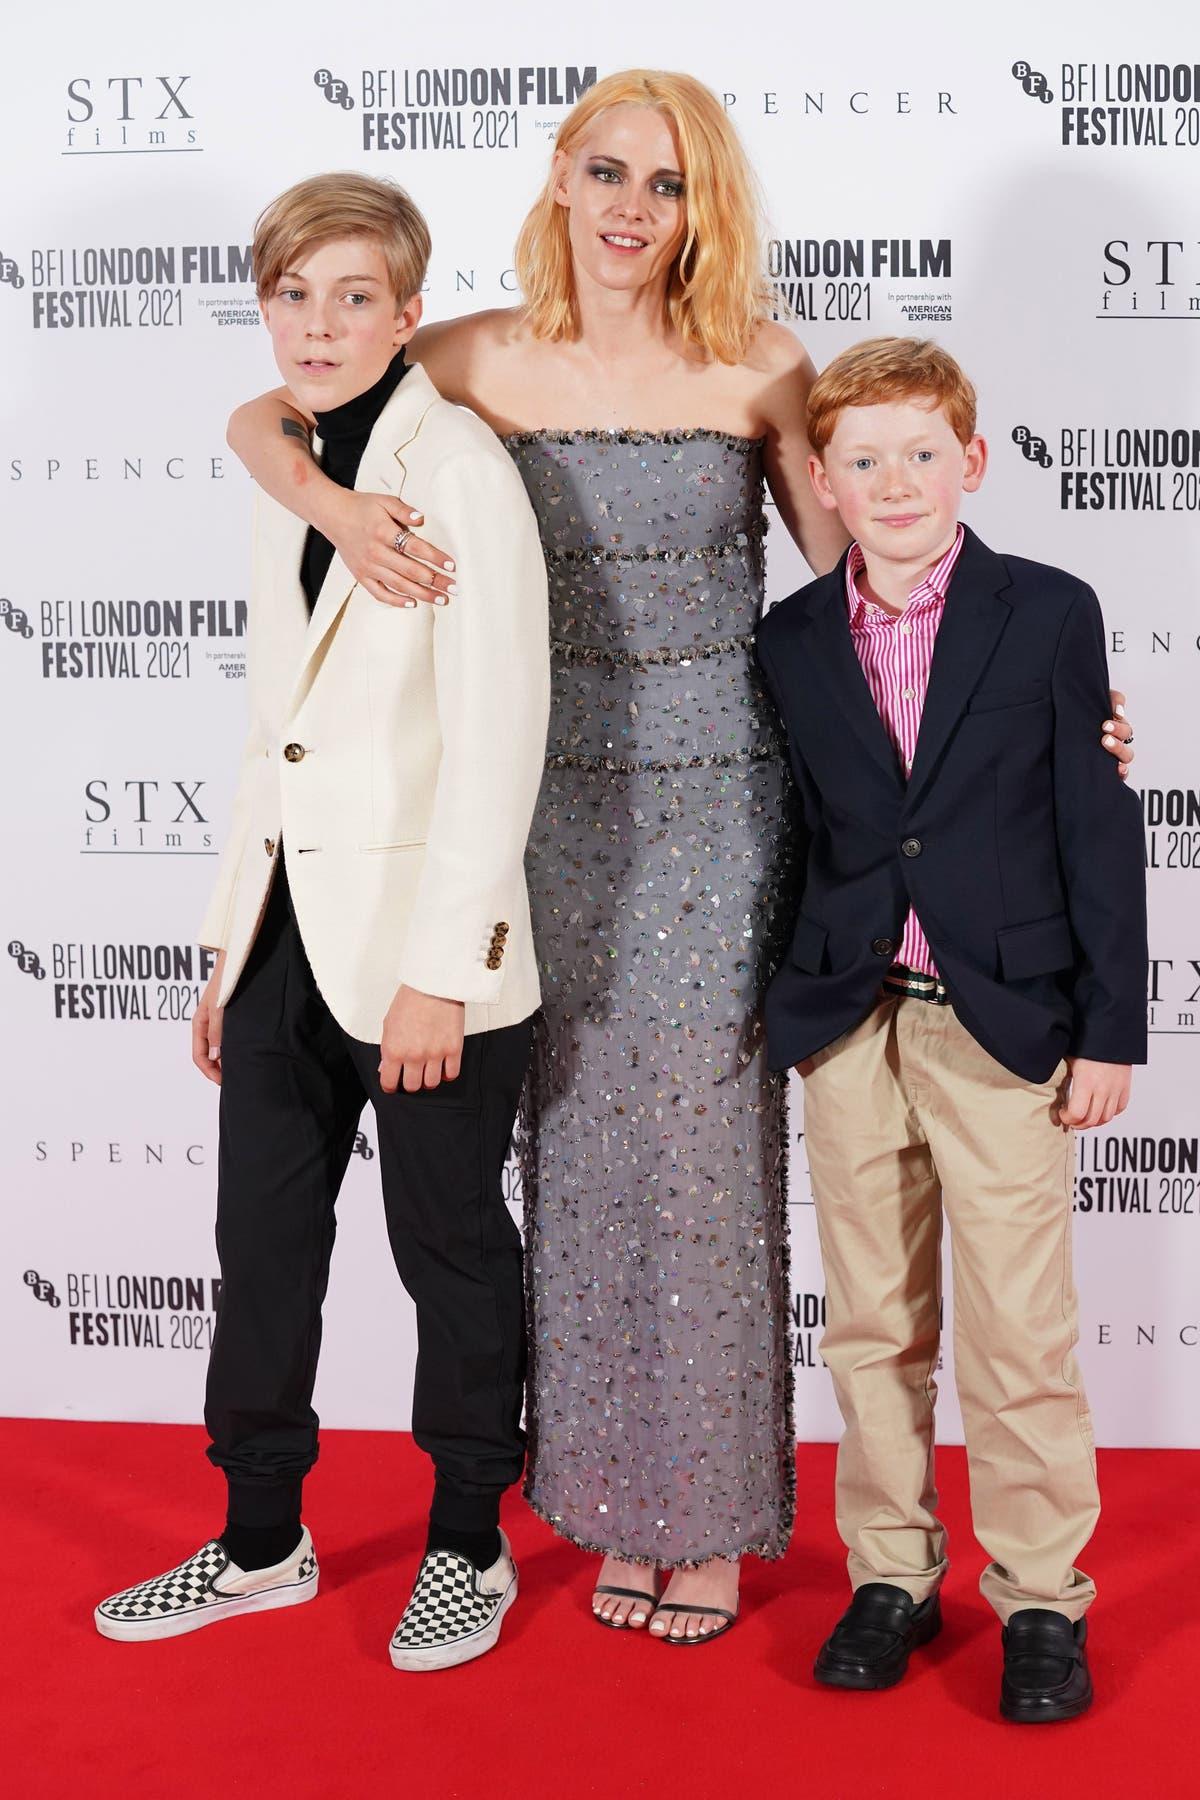 Kristen Stewart takes to red carpet at Spencer premiere